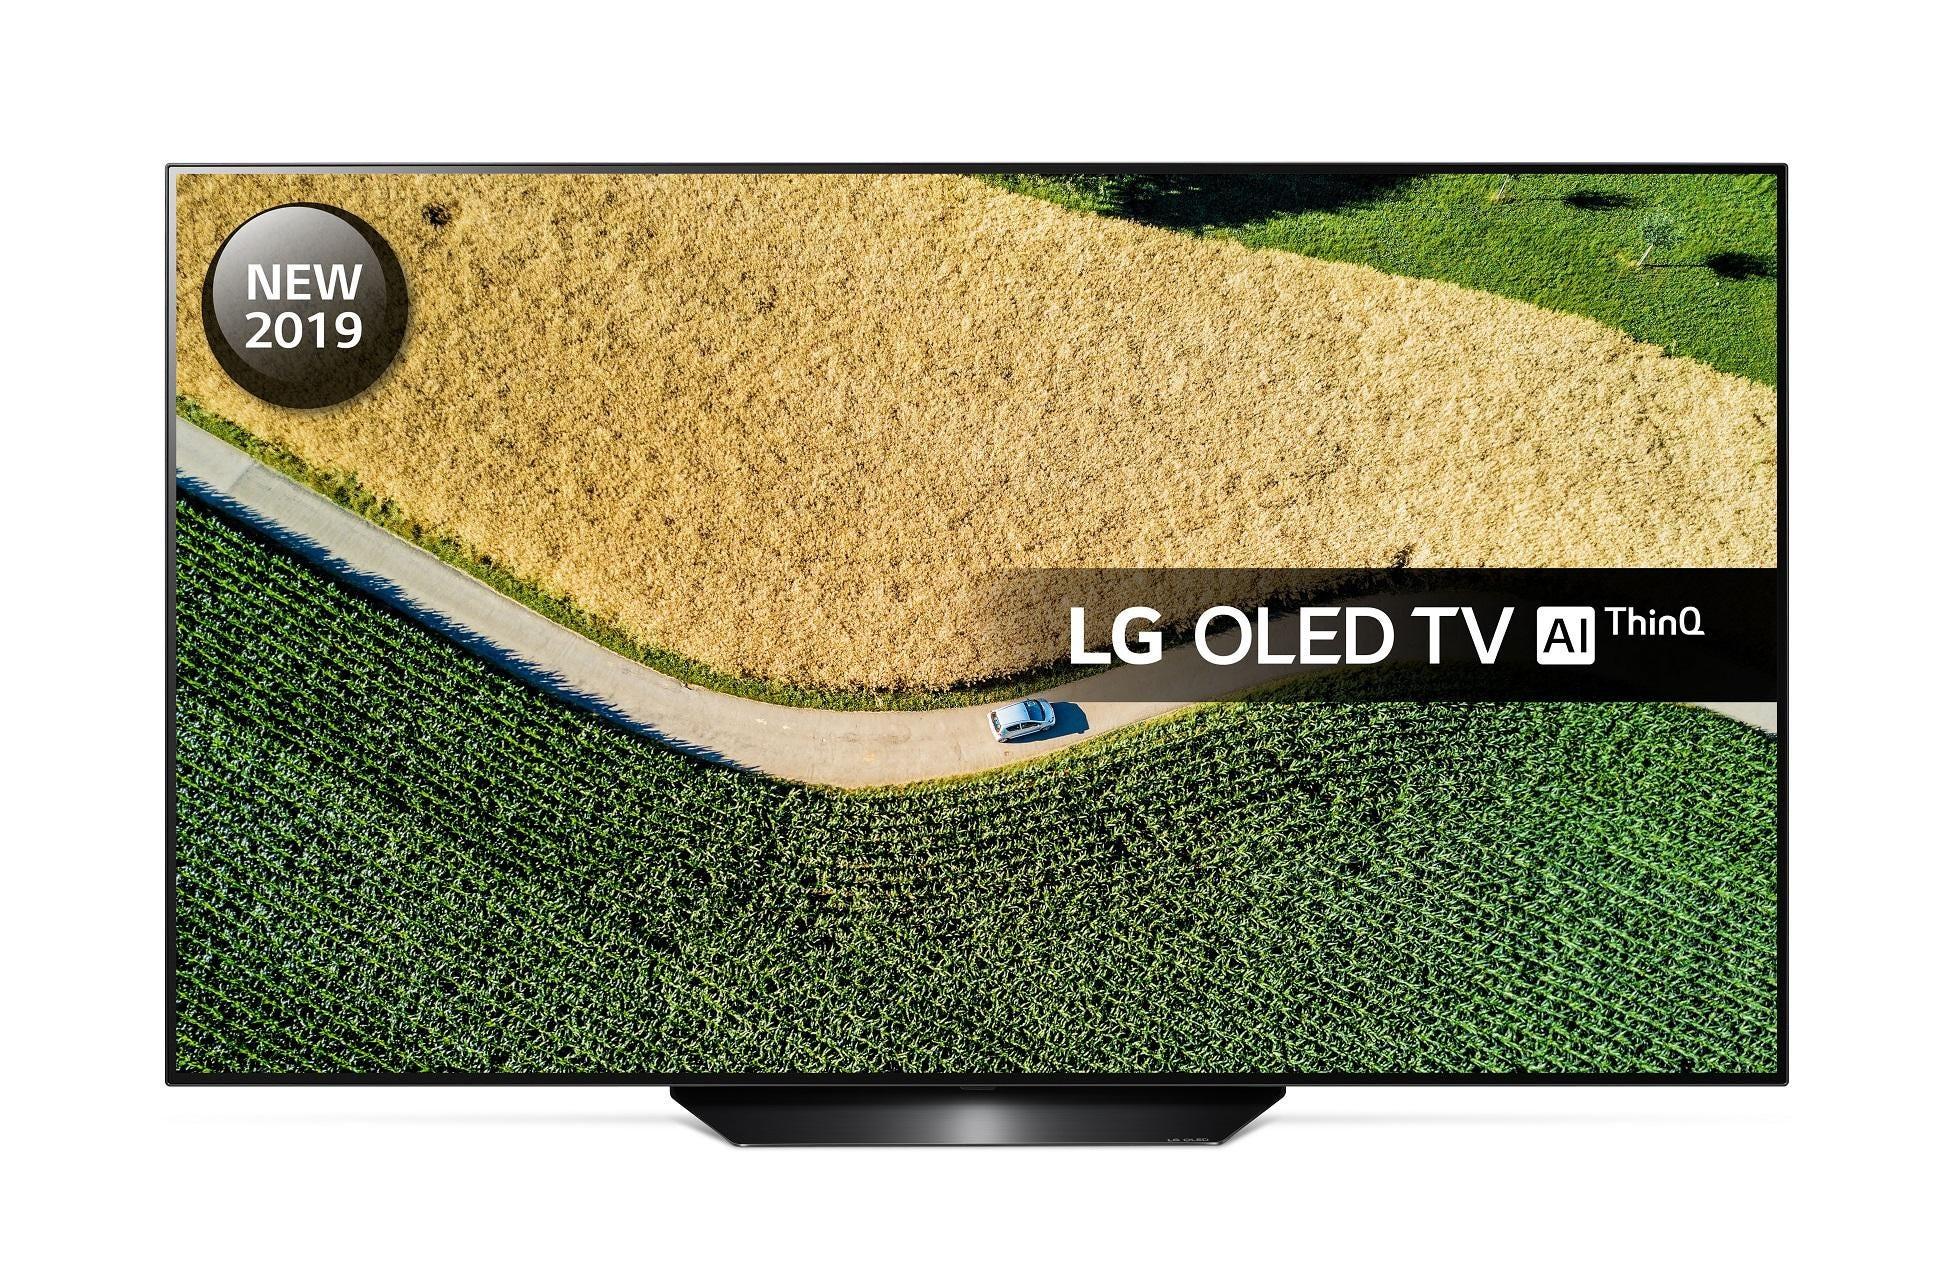 LG OLED55B9PLA 55 inch OLED 4K Ultra HD HDR Smart TV £1079 Richer Sounds